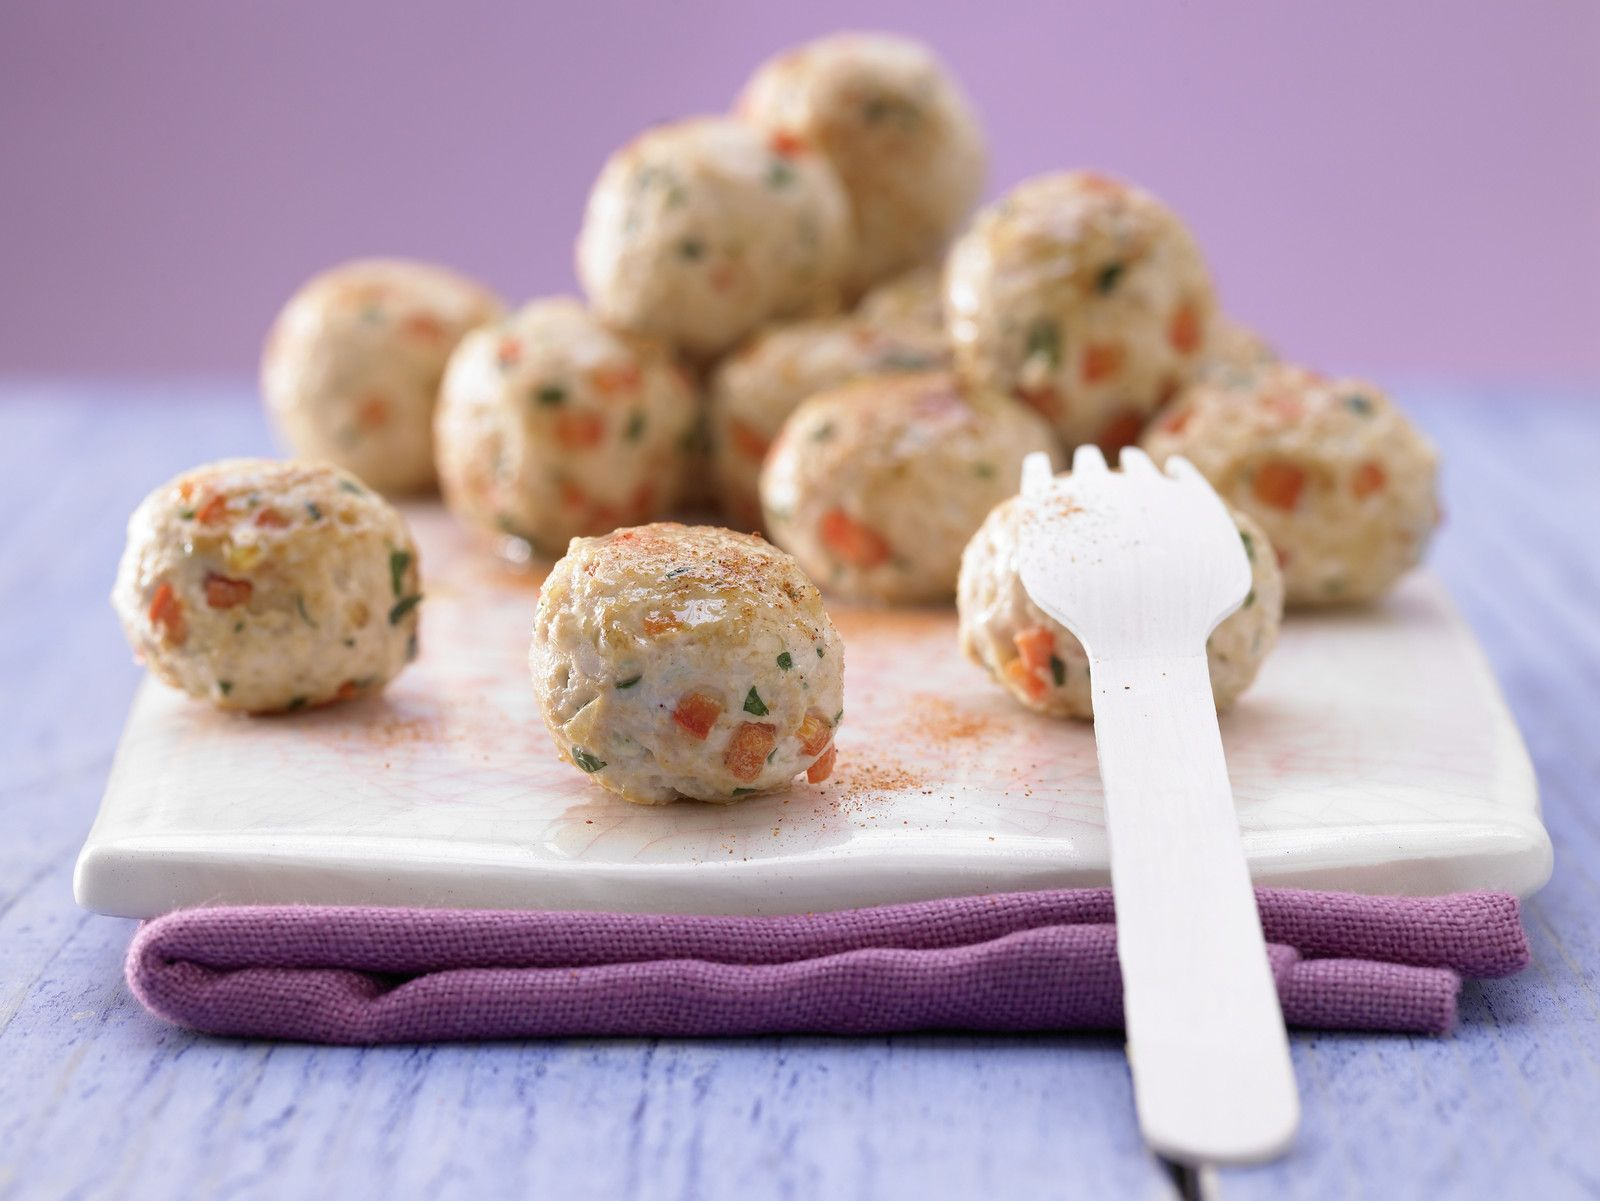 Kochbuch: Picknick | EAT SMARTER